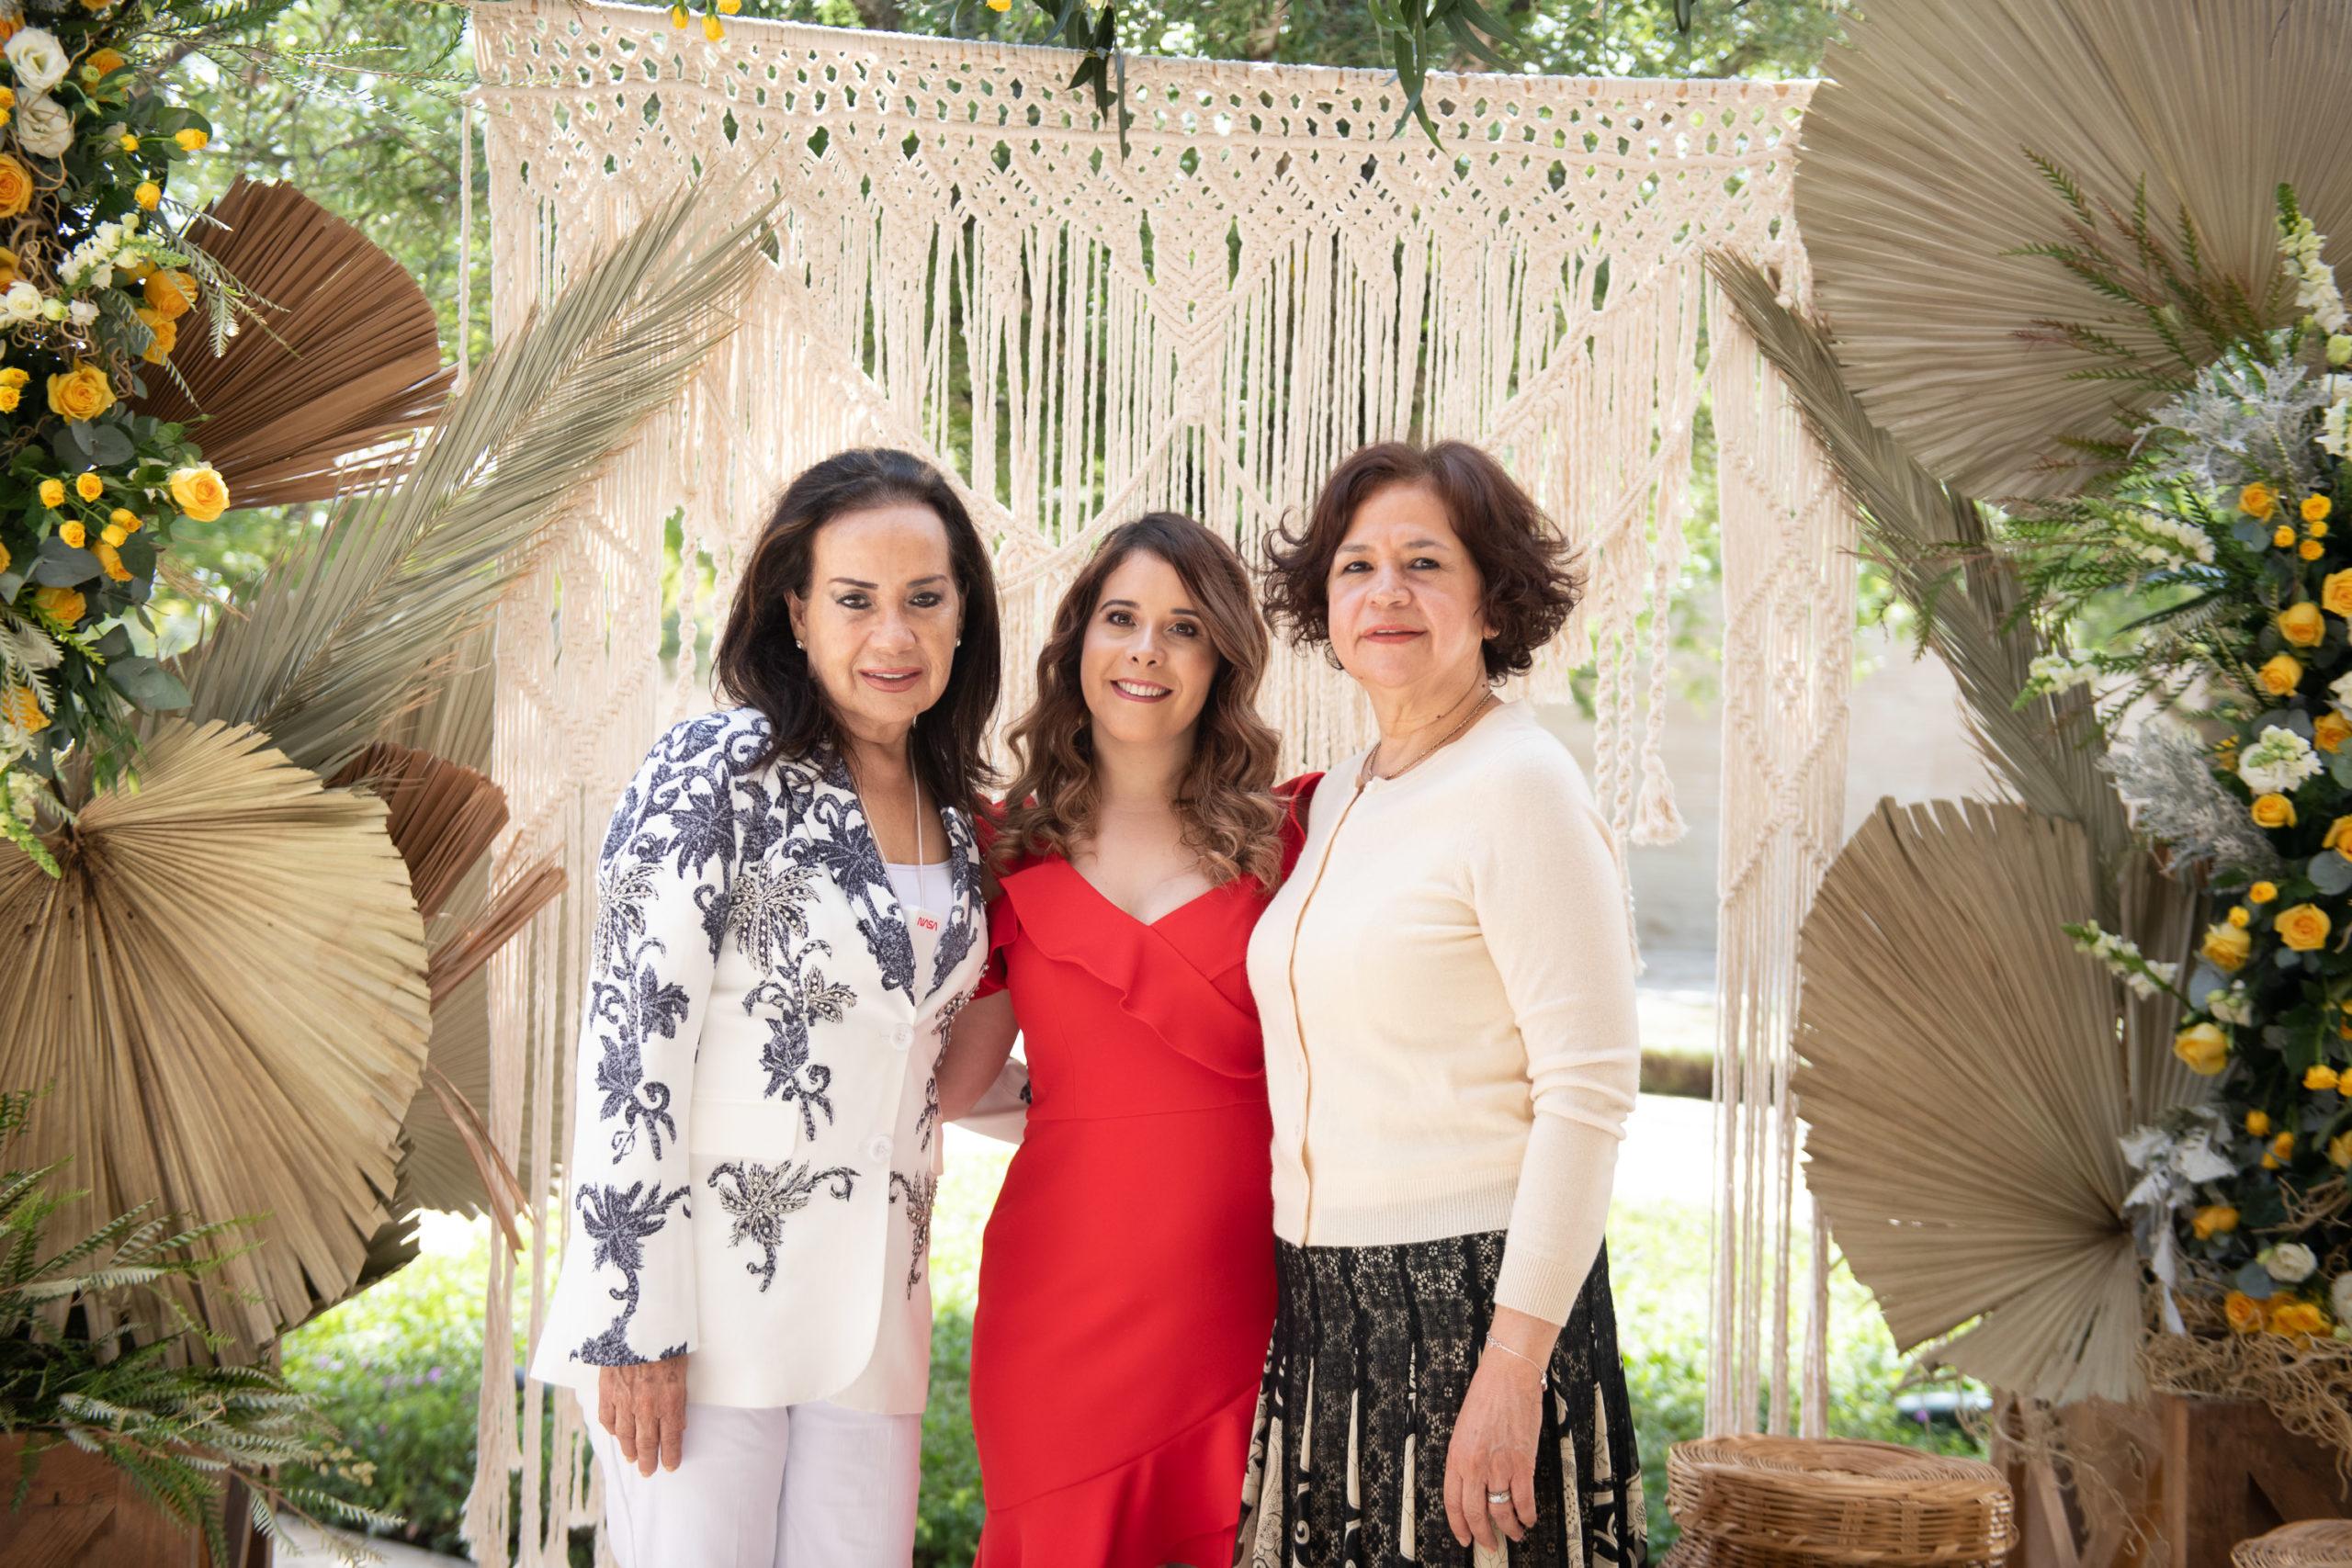 Denise Valdez de Obando, Romy Obando y Chiquis Álvarez de Barraza.